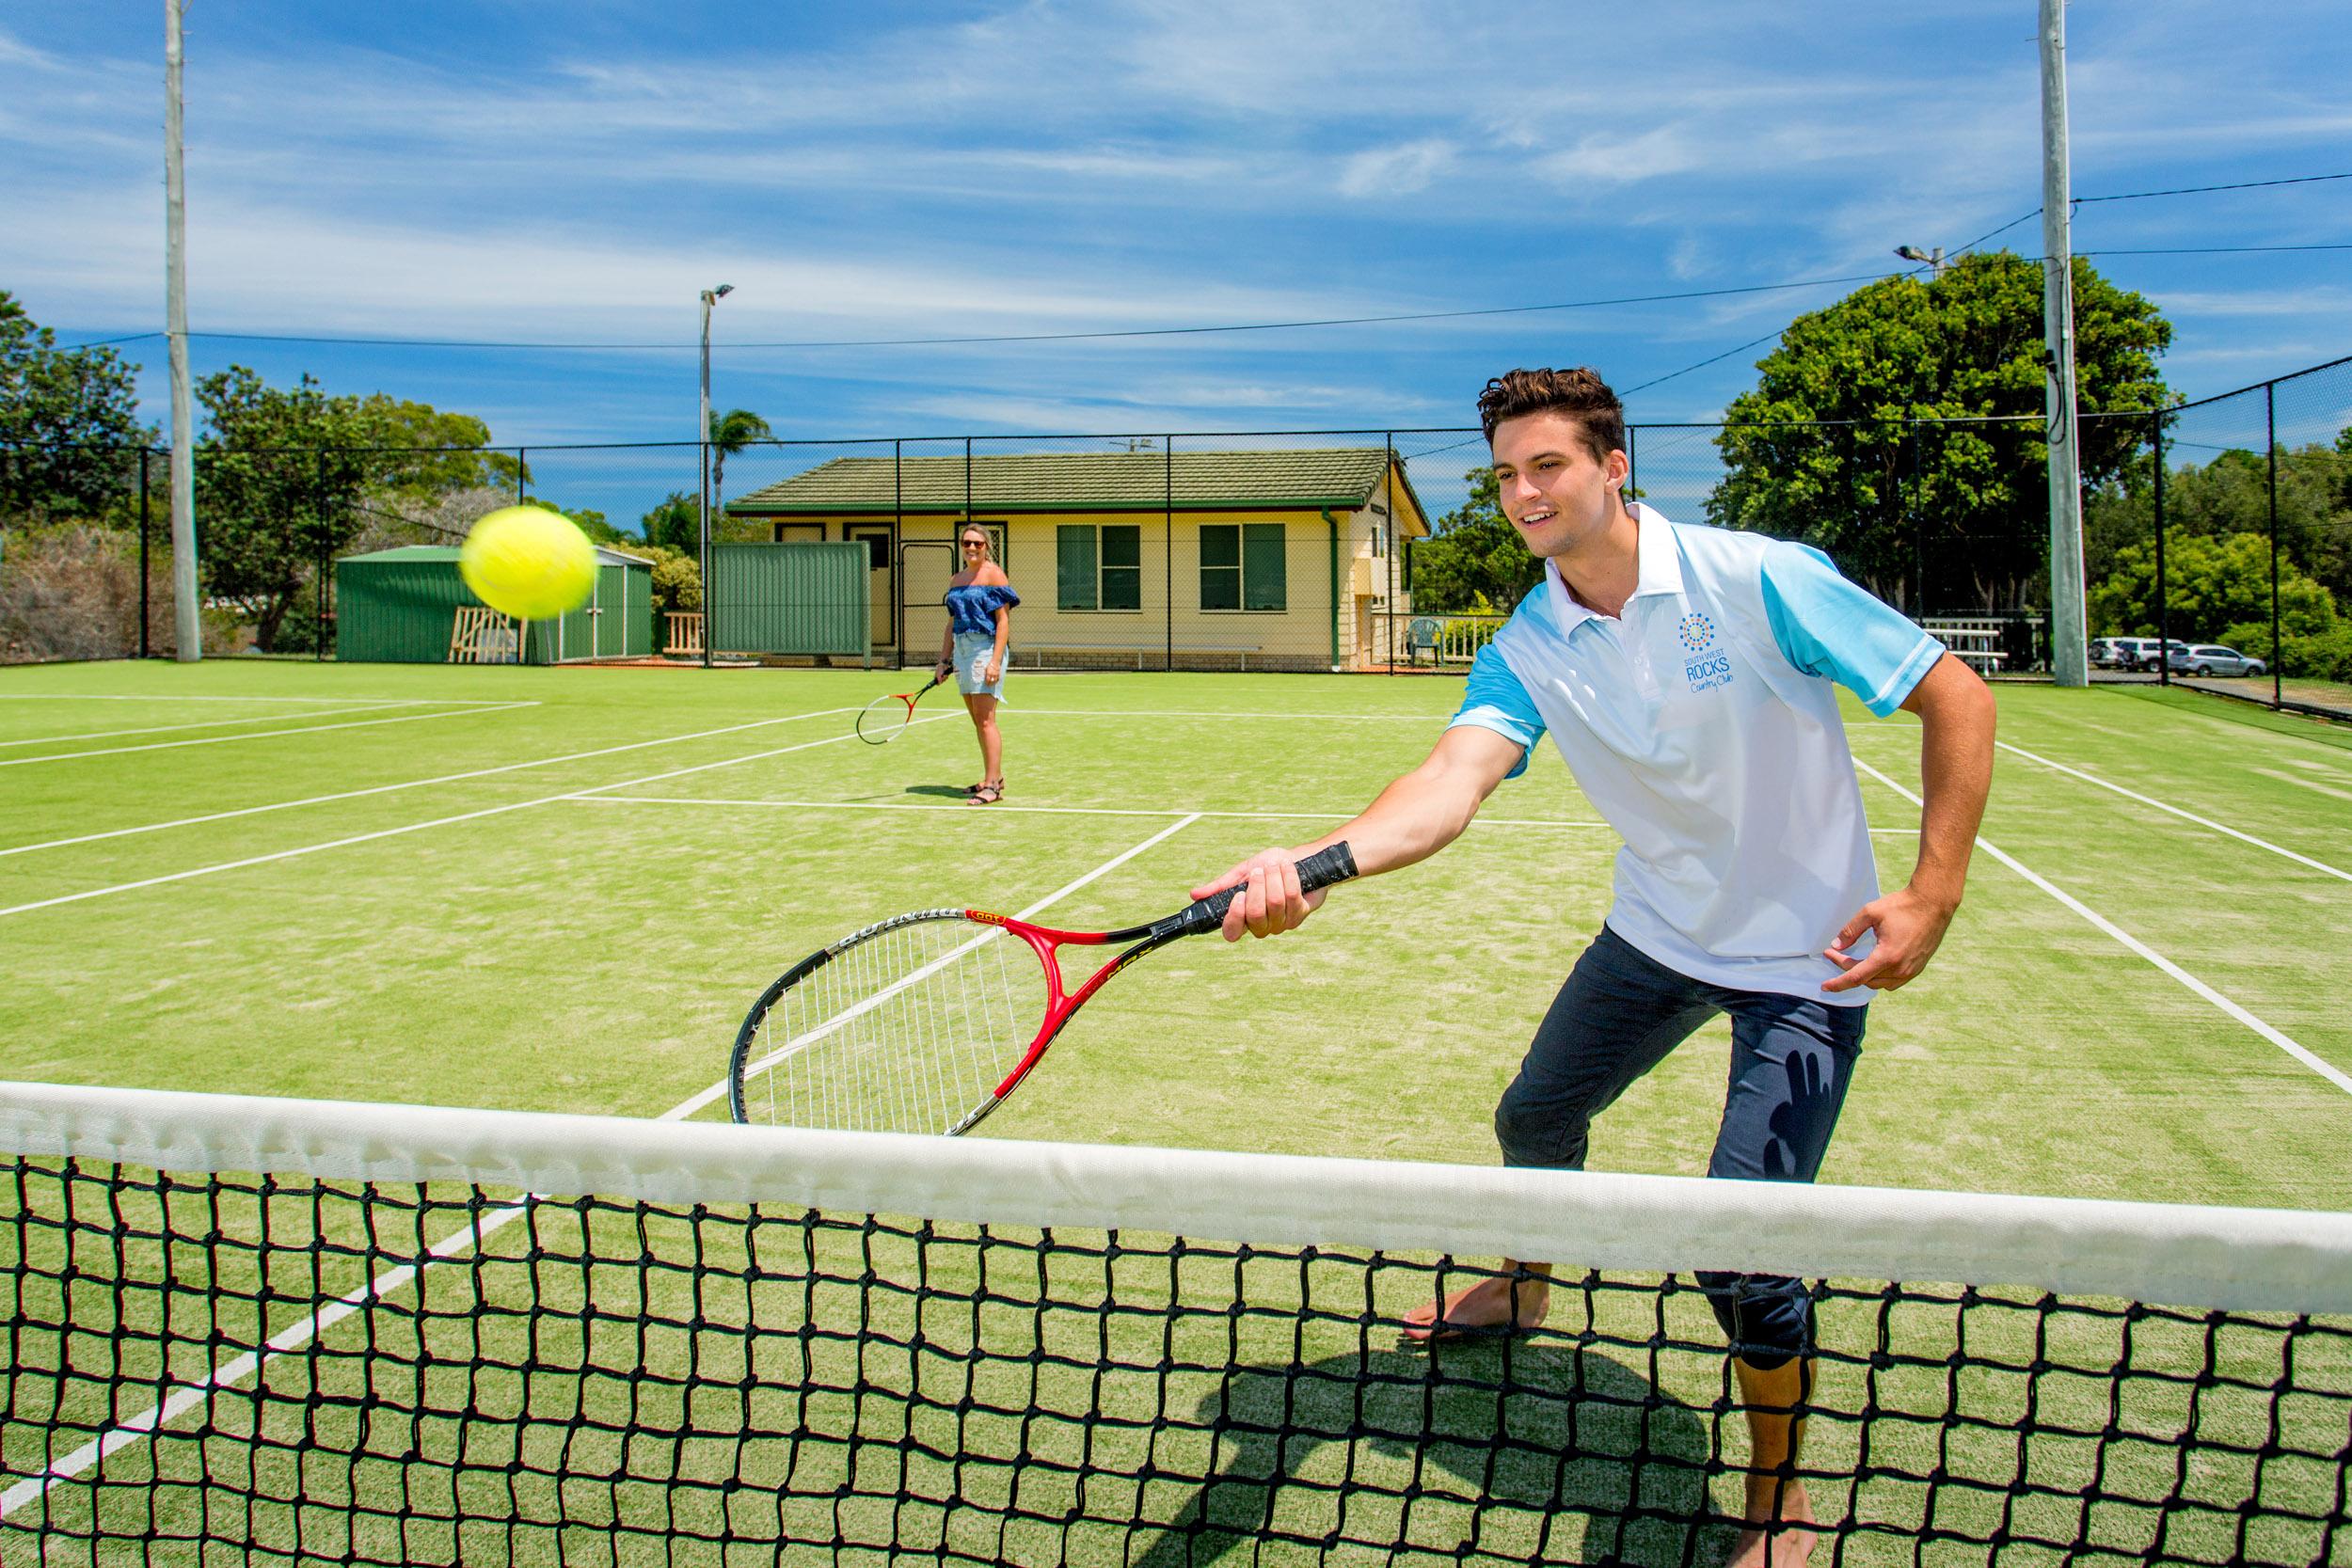 tennis-action-photo-club-social.jpg